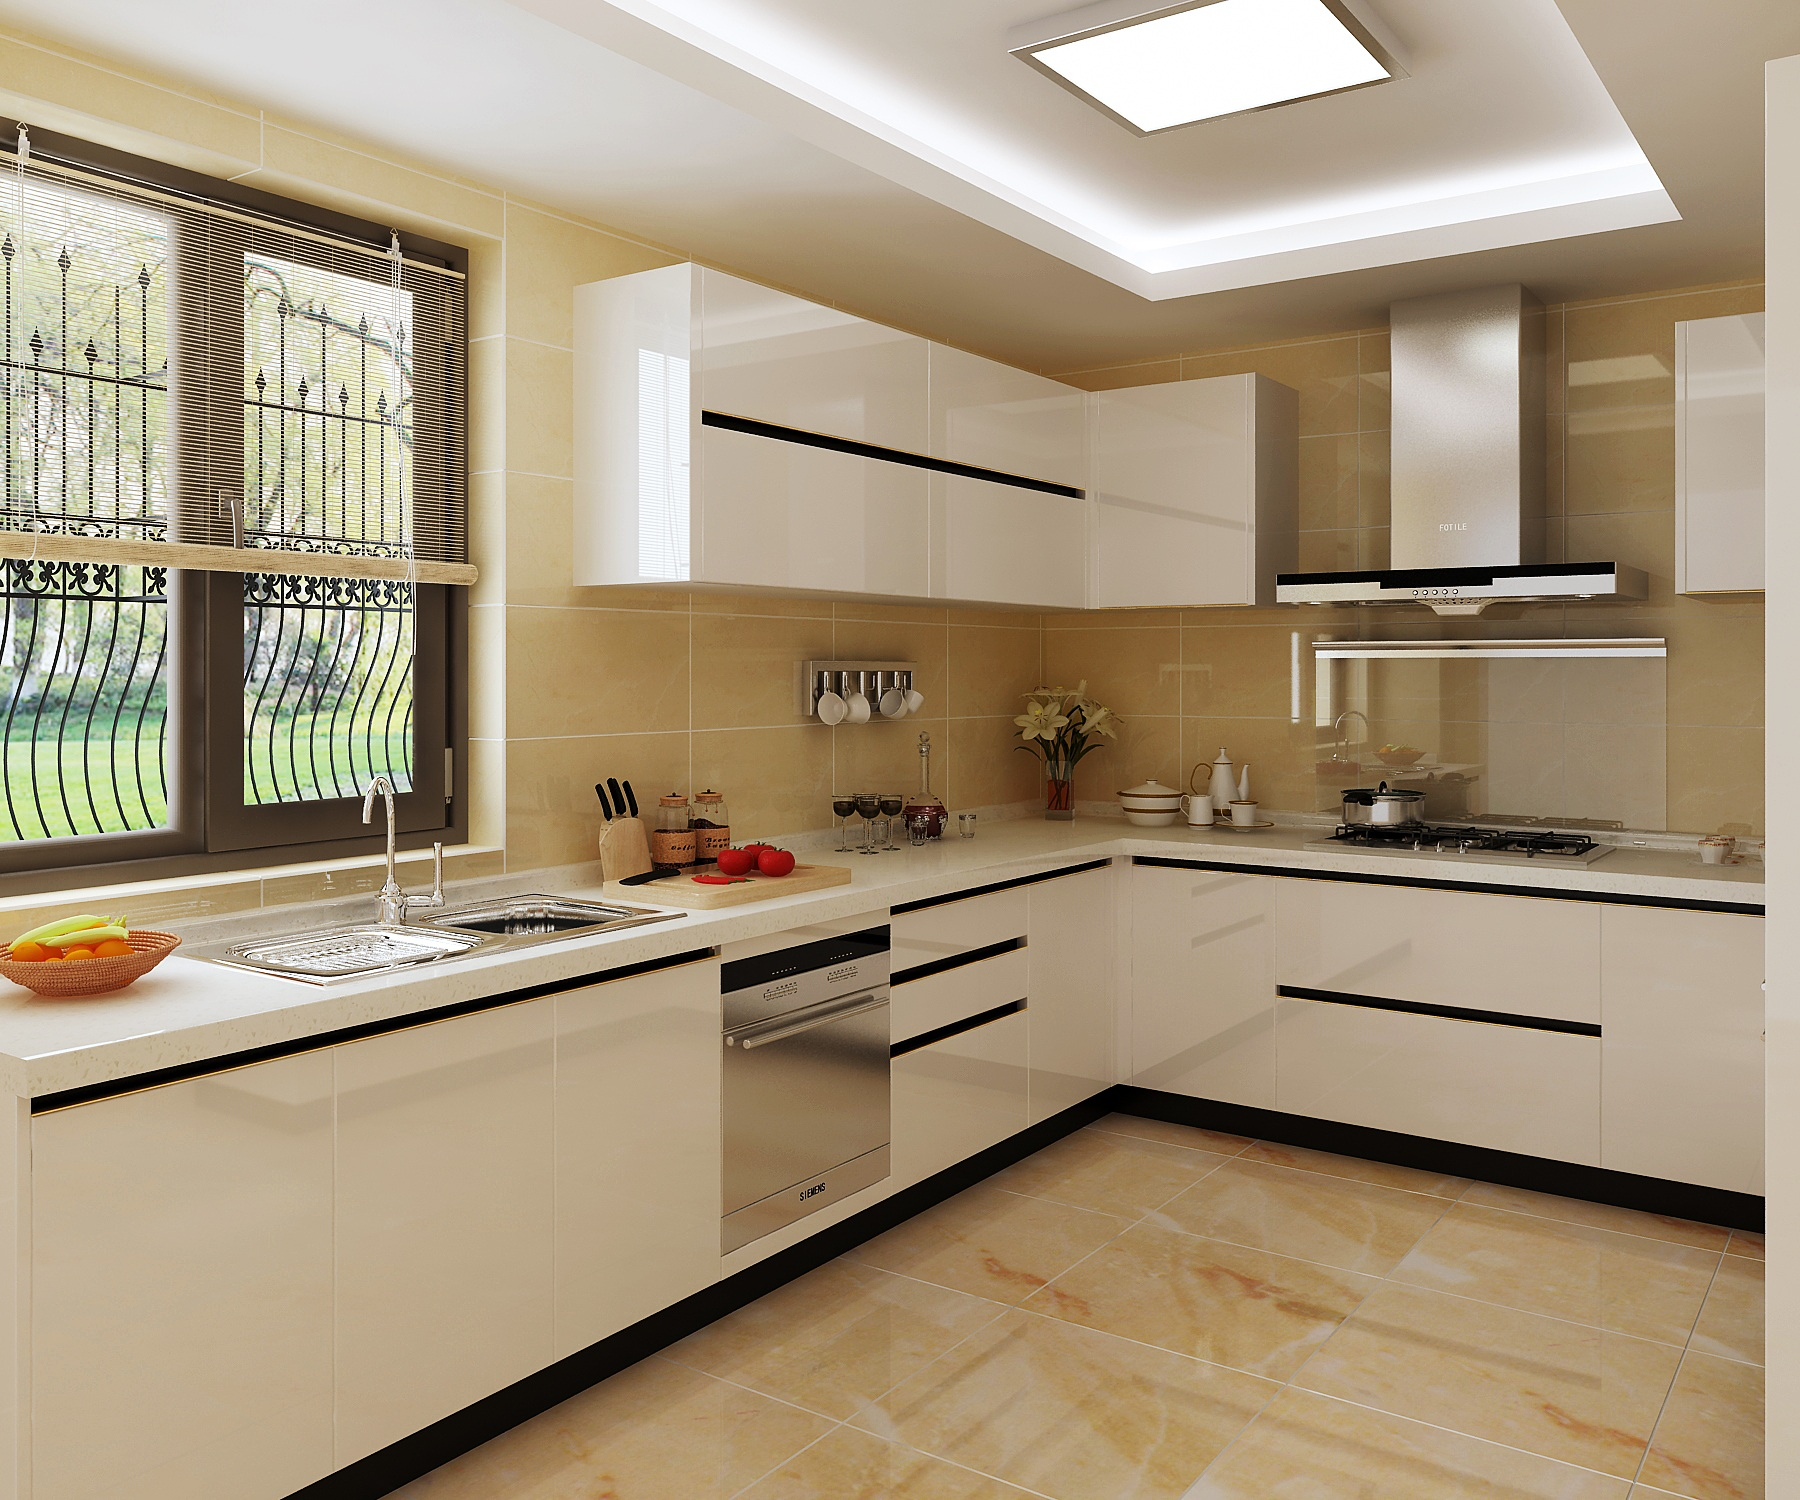 Kabinet Dapur Kayu Solid Cat Mobil Putih Sederhana Praktis Buy White Paint Kitchen Cabinet Solid Wood Kitchen Cabinet White Kitchen Cabinet Product On Alibaba Com